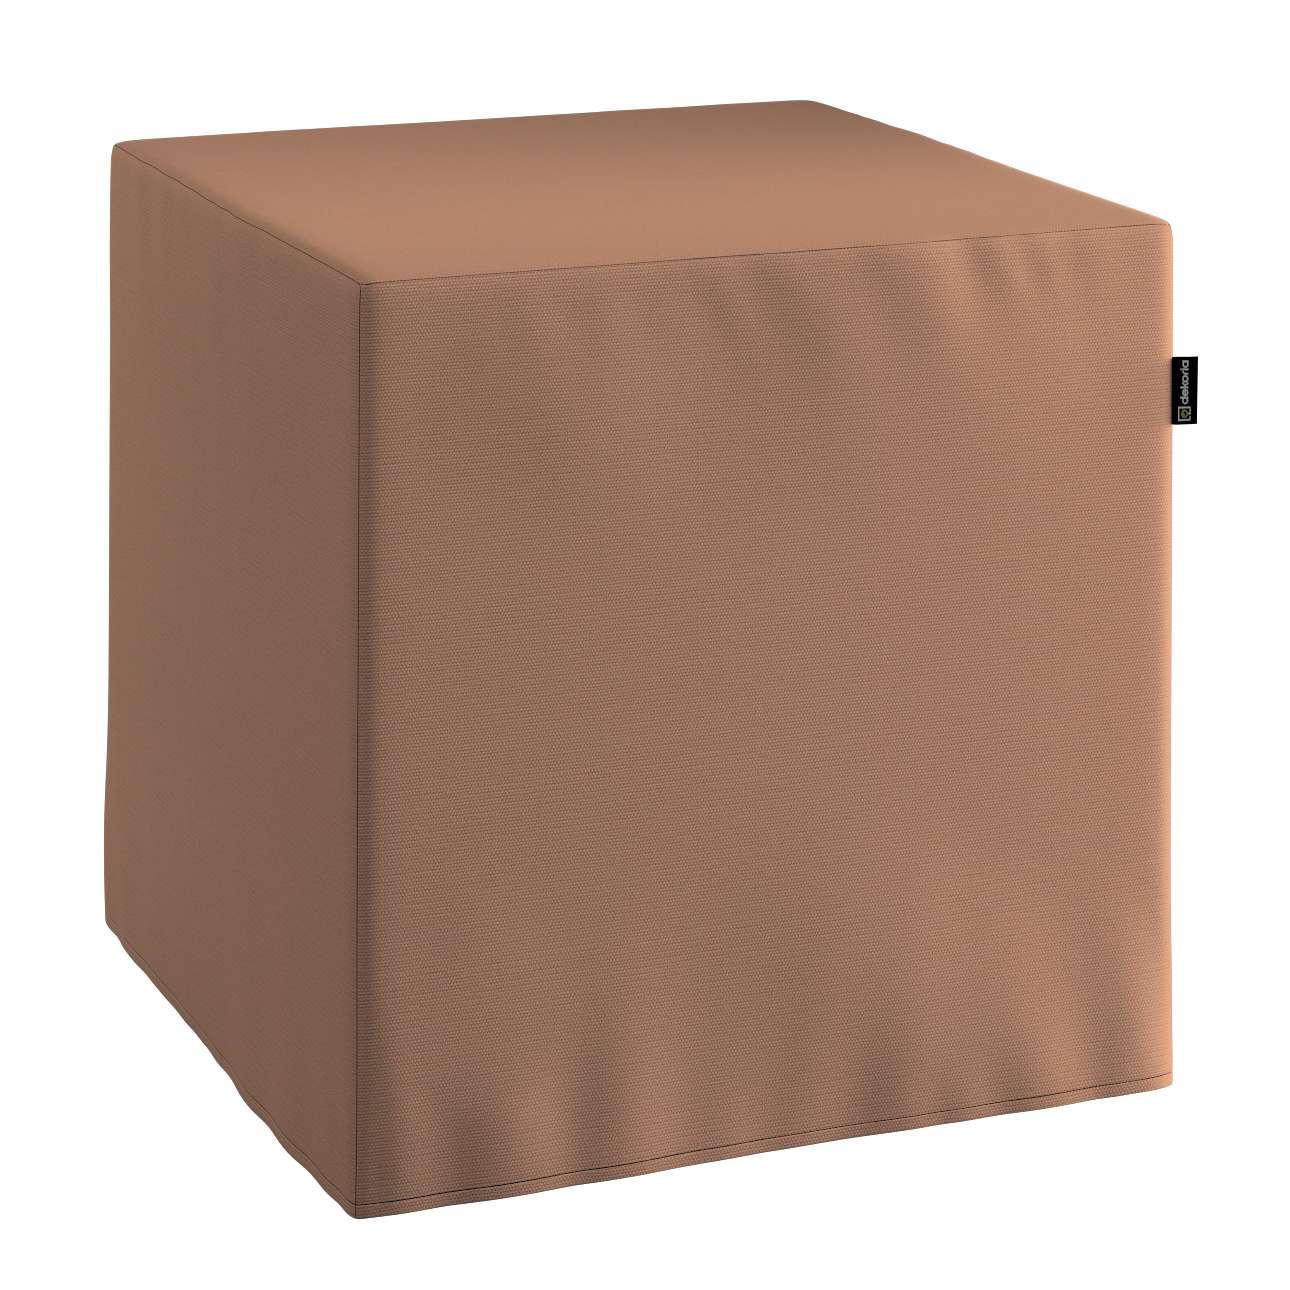 Sedák kostka - pevná 40x40x40 v kolekci Cotton Panama, látka: 702-02